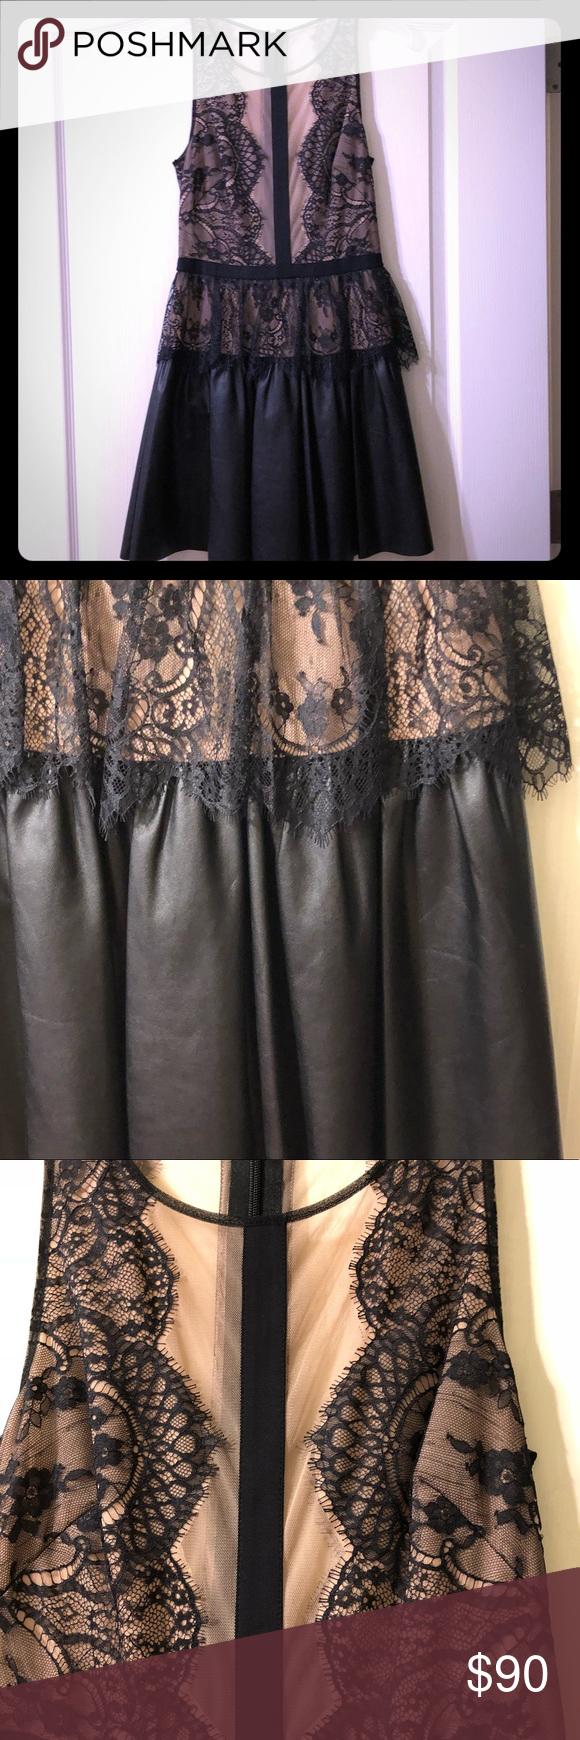 40490b6b7f9 BCBGMAXAZRIA Layton cocktail dress in 2018